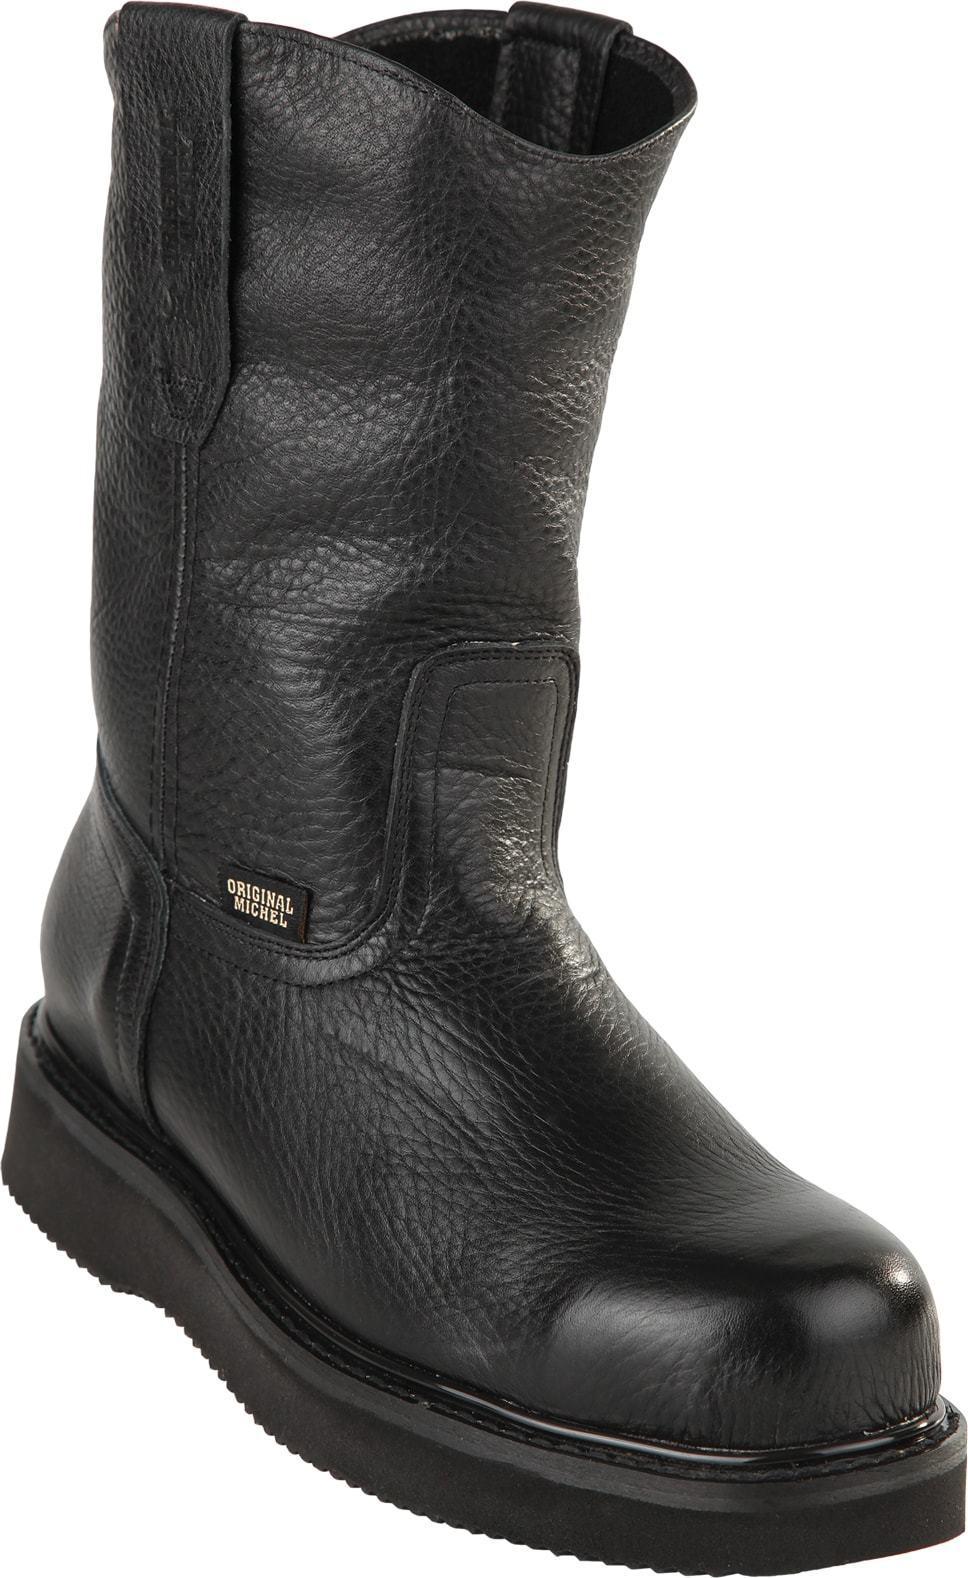 Men's Original Michel Genuine Leather Pull On Western Work Boots Steel Toe